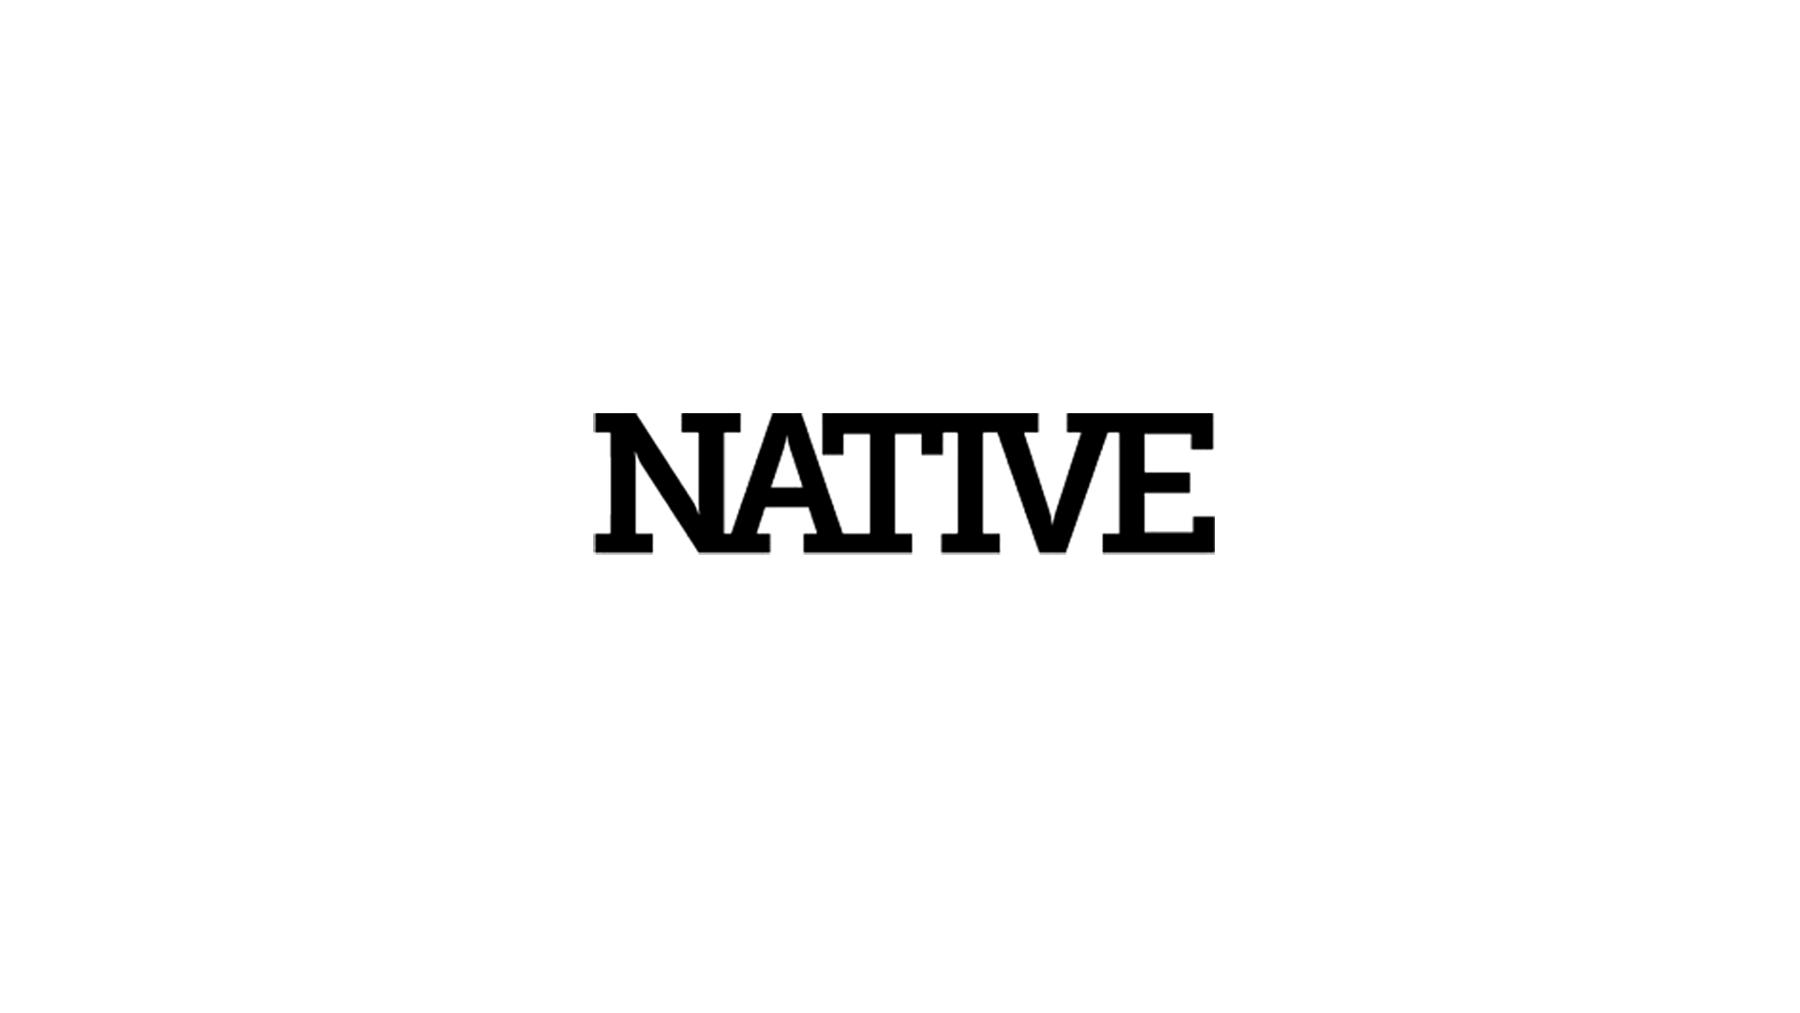 Come Together Create - Jonathan Pears - Native.jpg